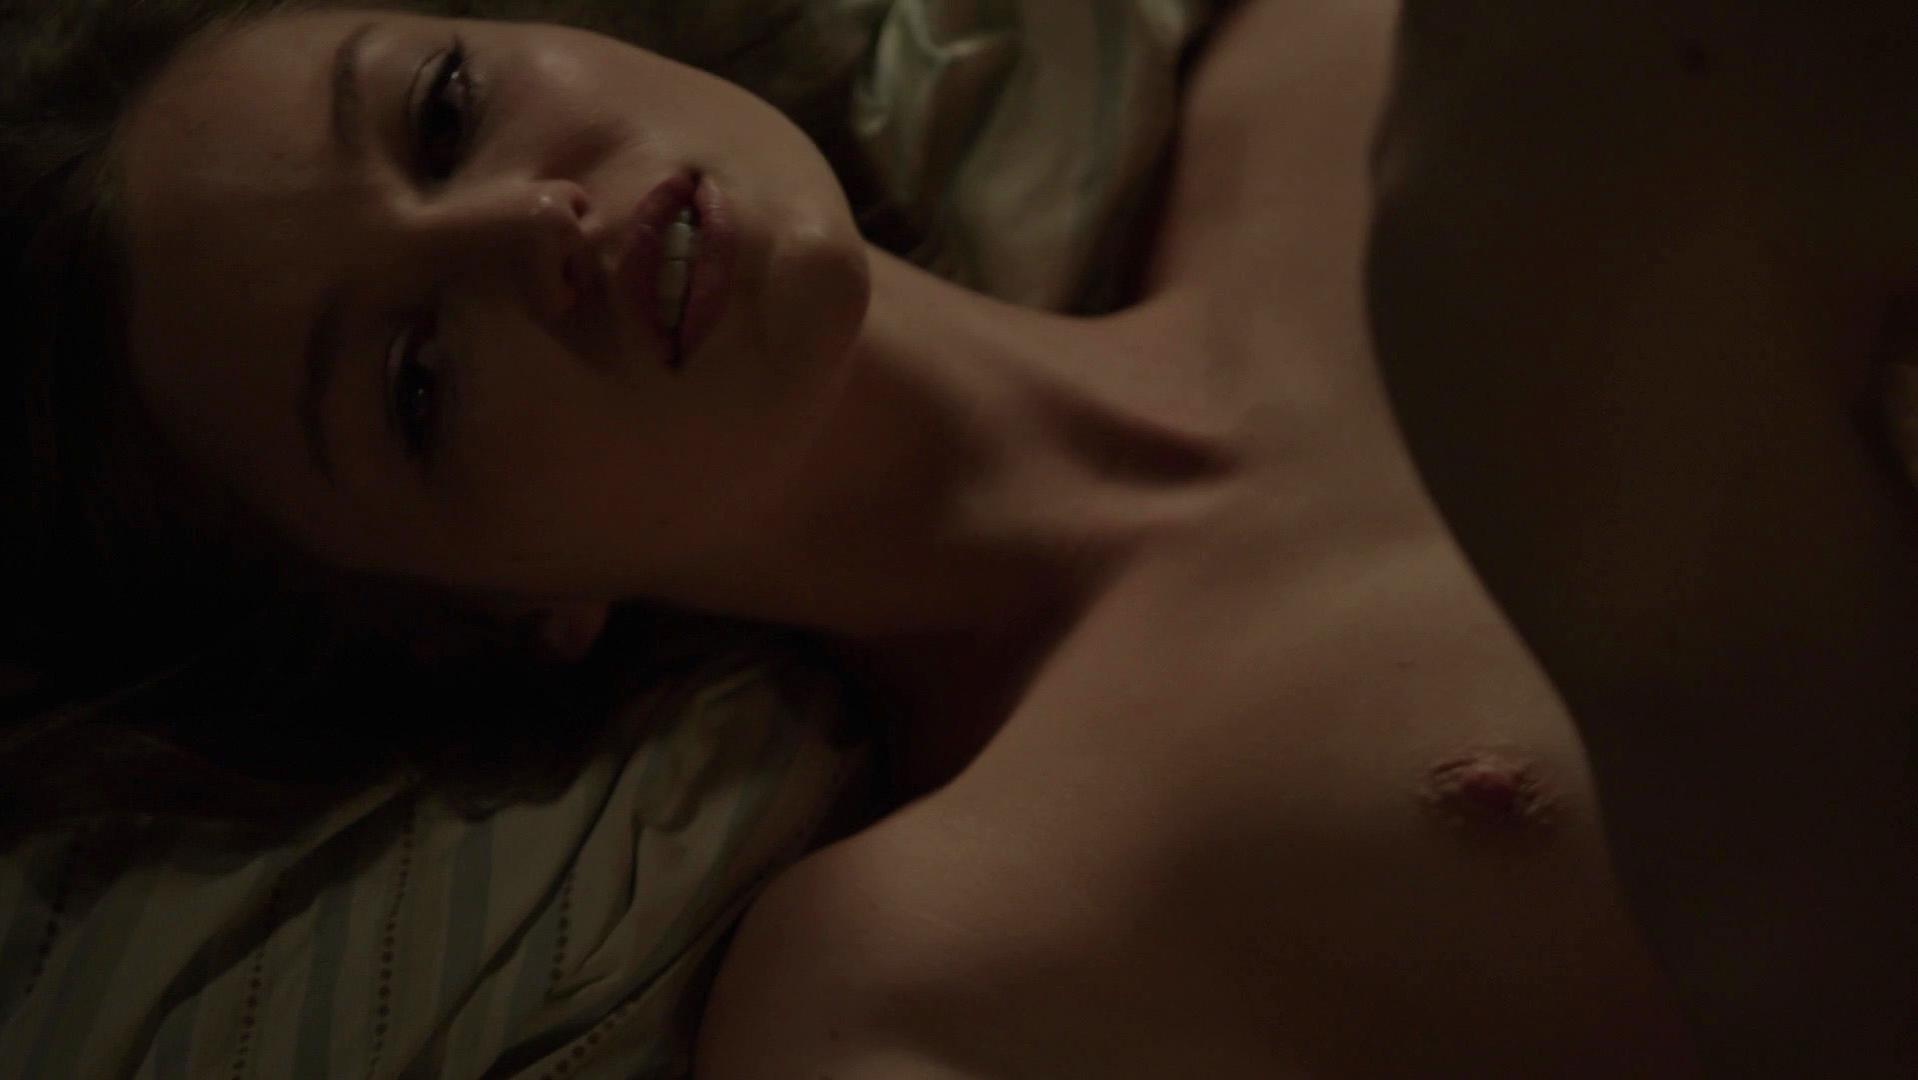 Lili Simmons nude - Banshee s02e04 (2014)